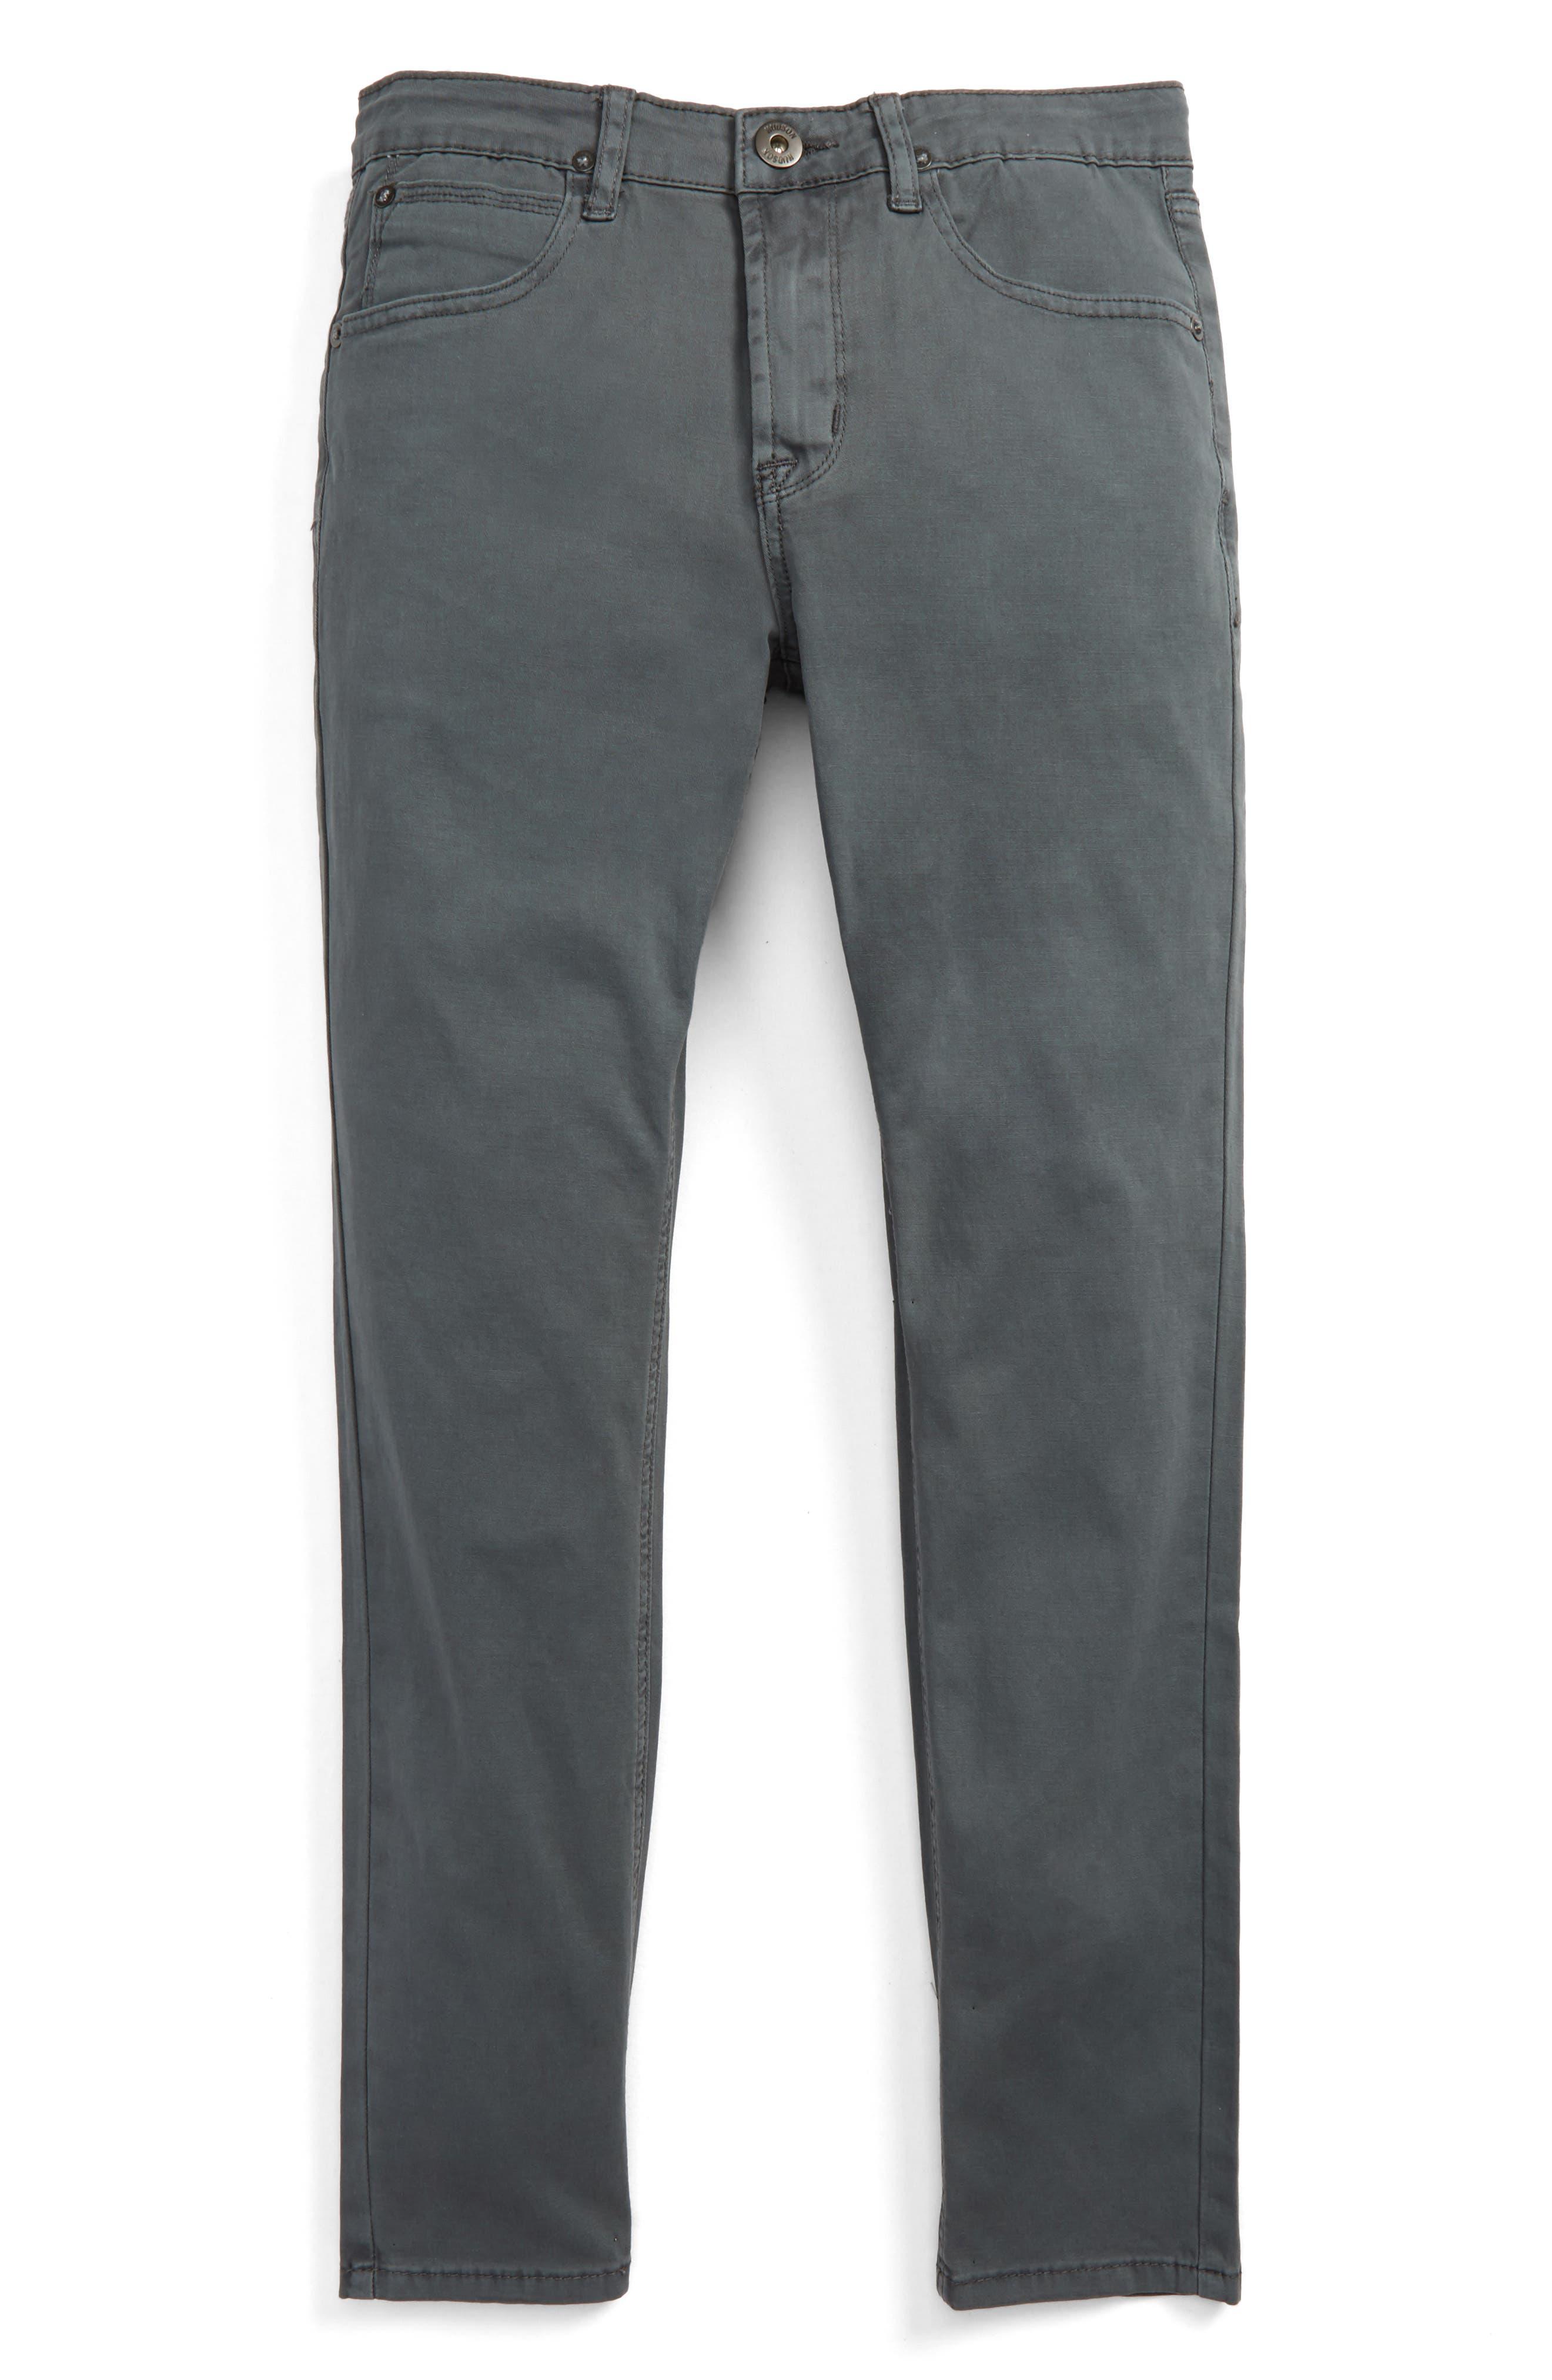 Main Image - Hudson Jeans Jagger Slim Fit Straight Leg Pants (Big Boys)